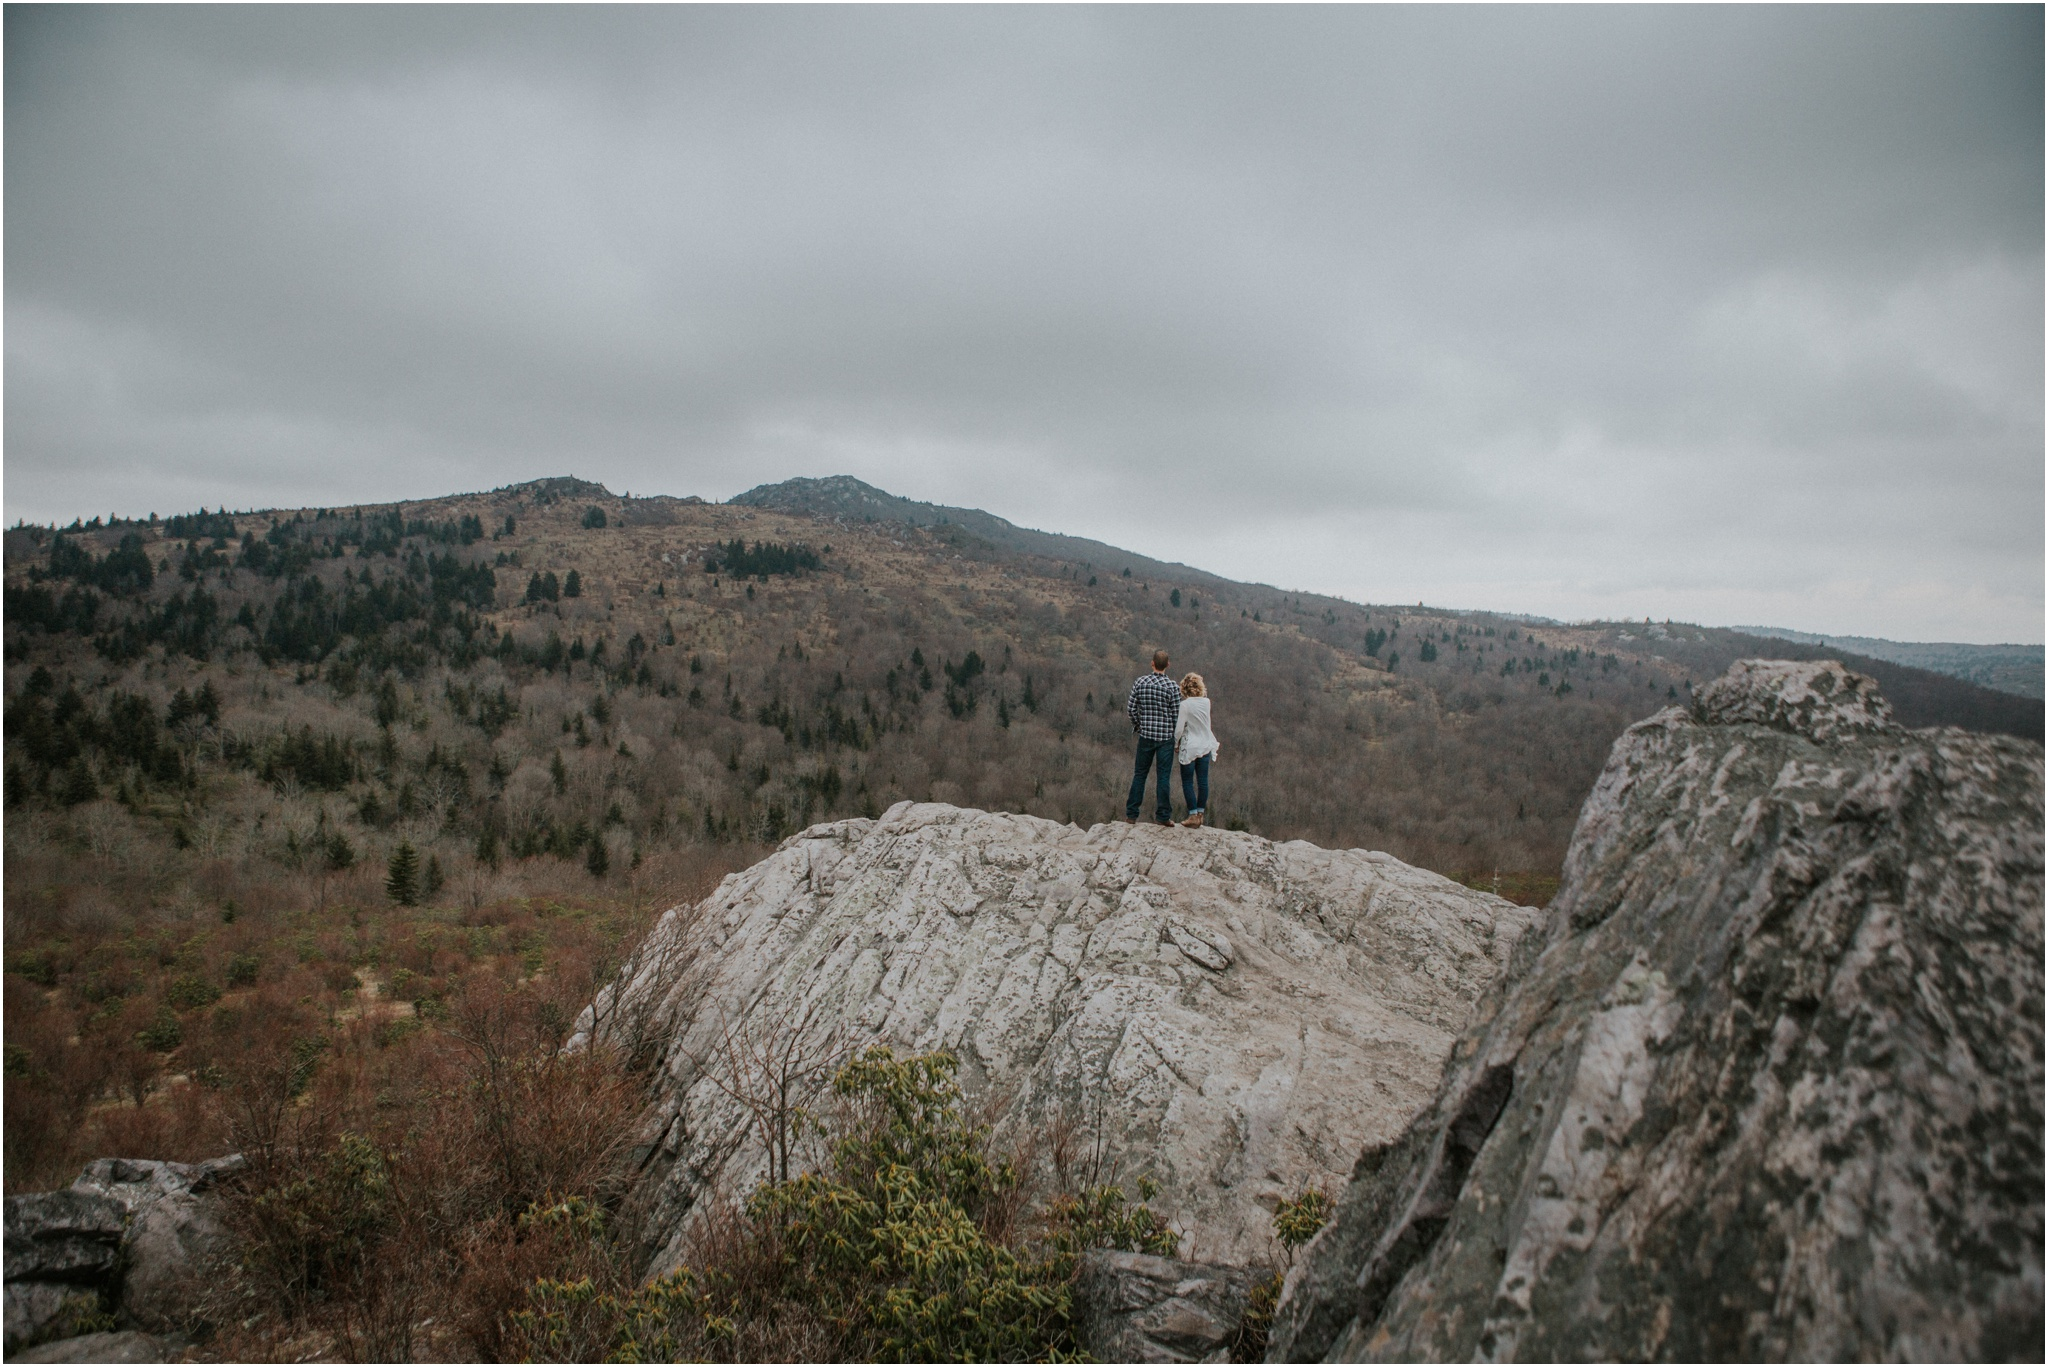 grayson-highlands-engagement-session-foggy-mountain-rustic-appalachian-virginia-katy-sergent-photography_0028.jpg